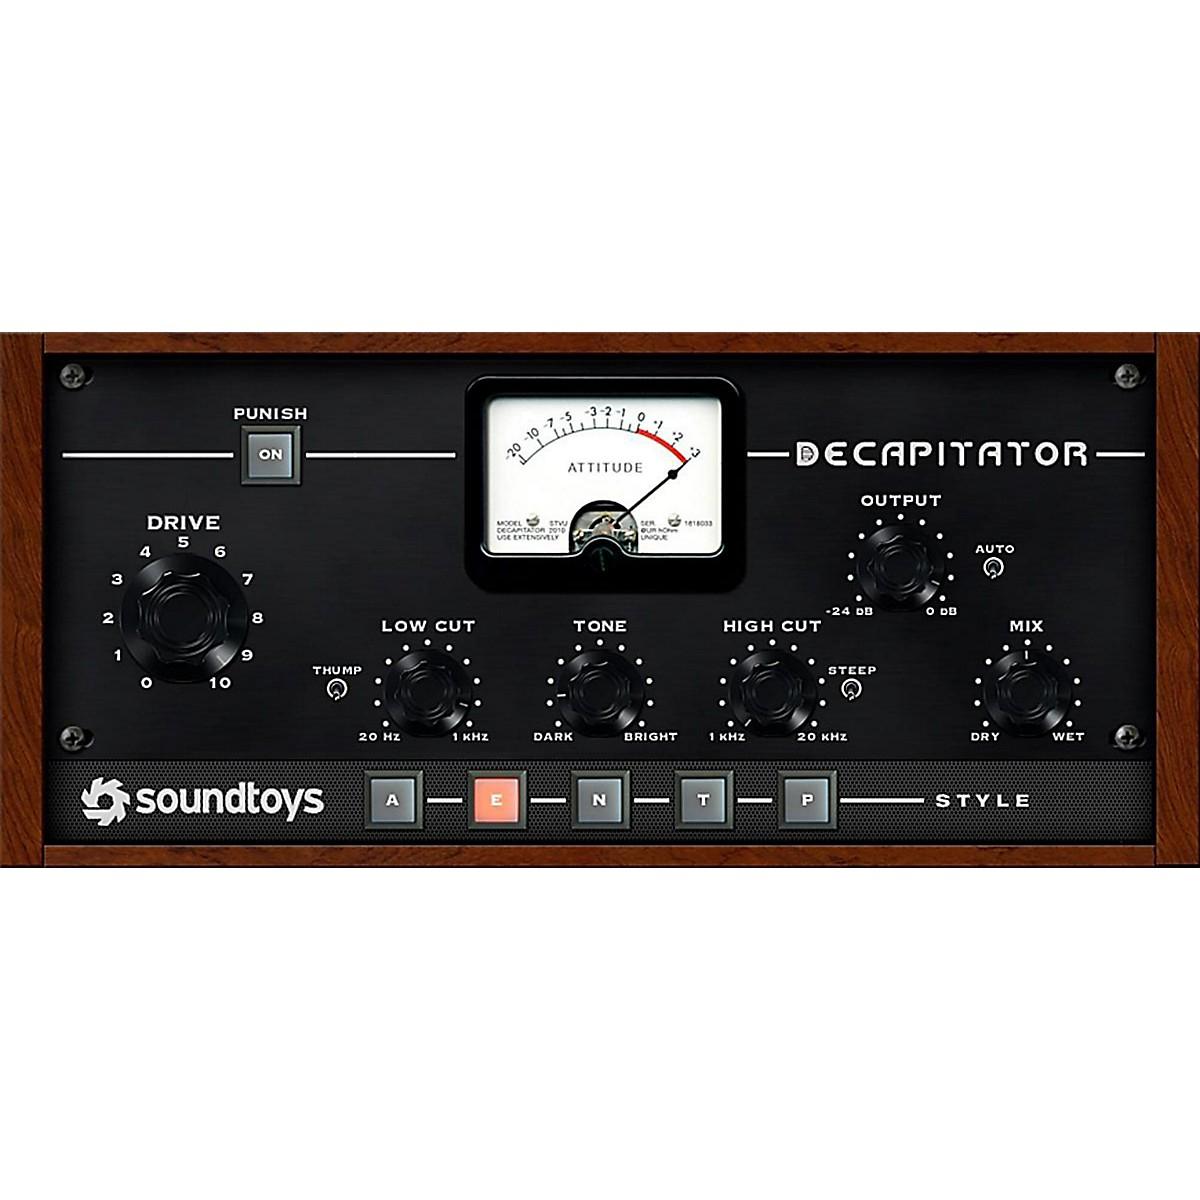 Soundtoys Decapitator 5 Software Download